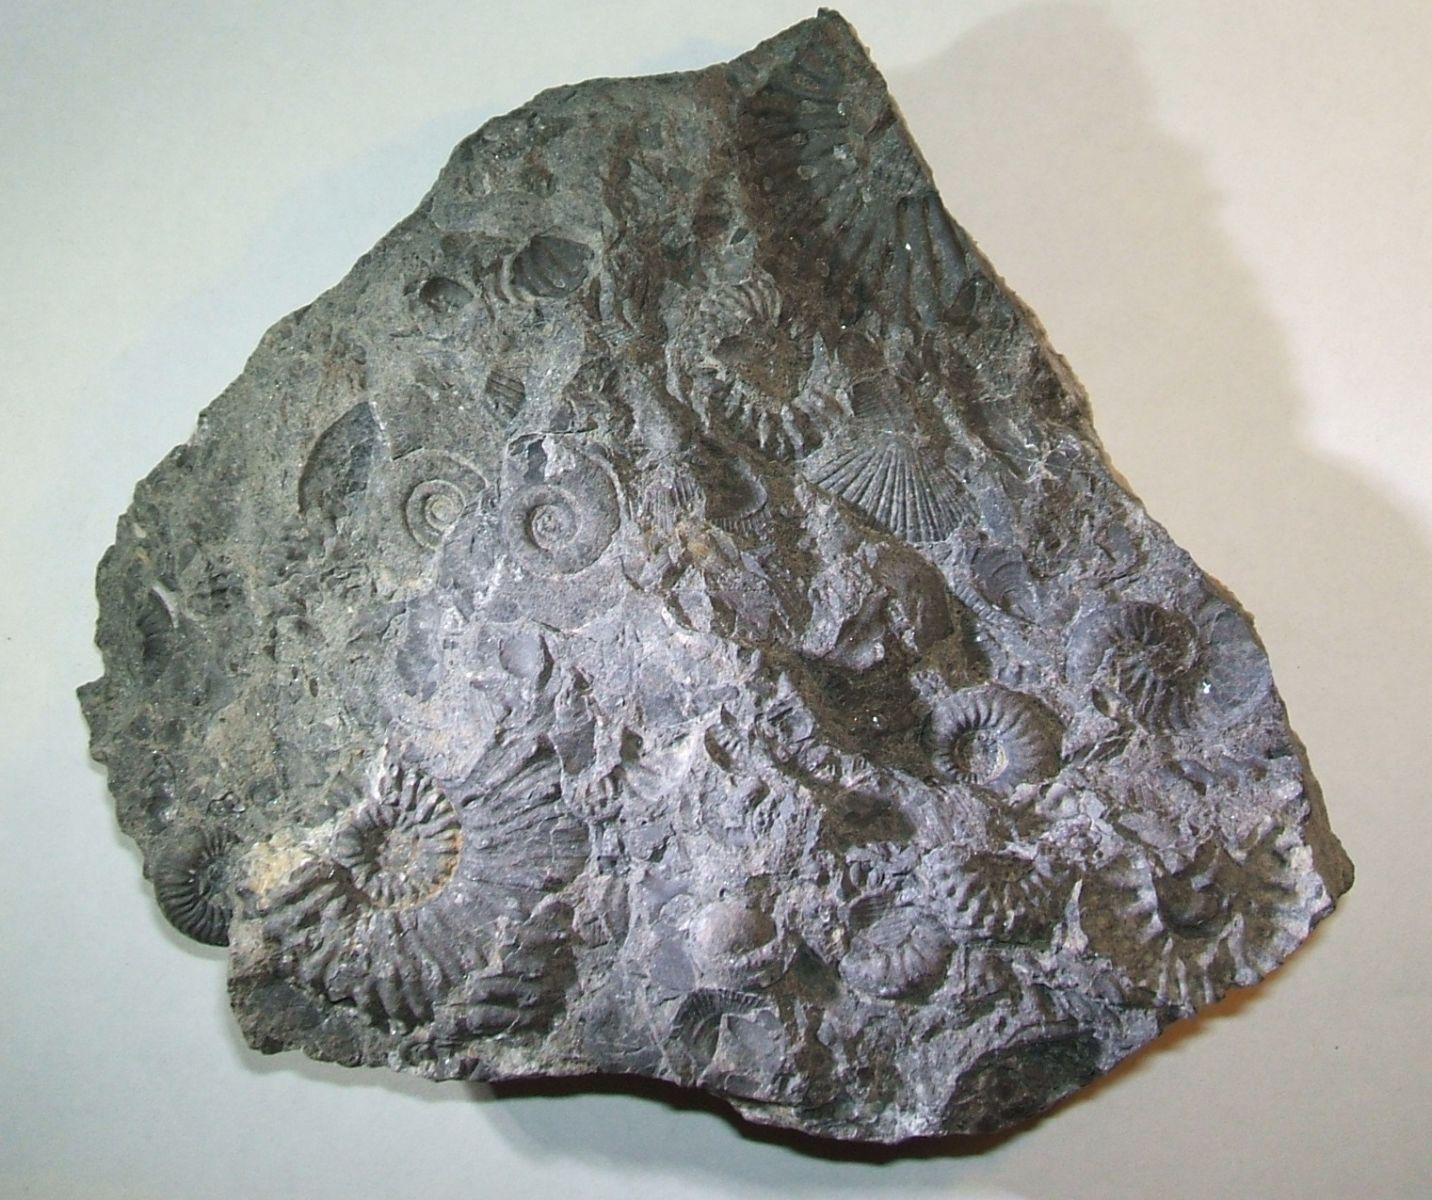 4 Ammonites species and 1 brachiopod